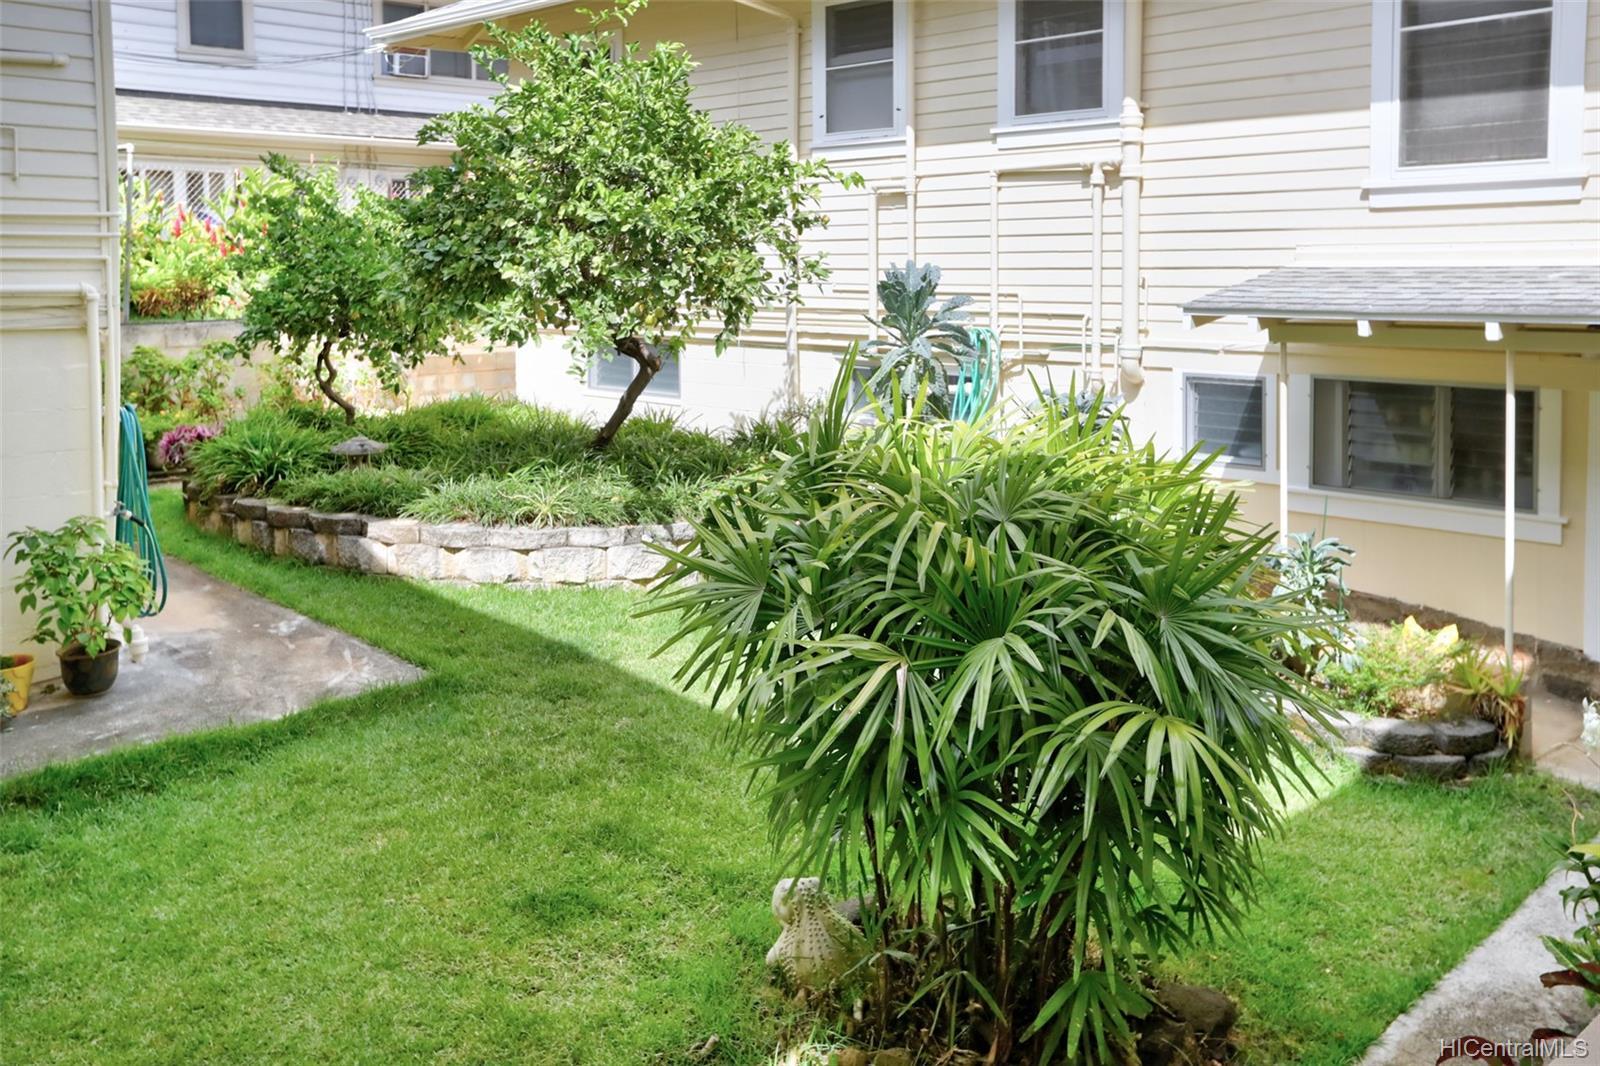 810 Green Street Honolulu - Multi-family - photo 23 of 25